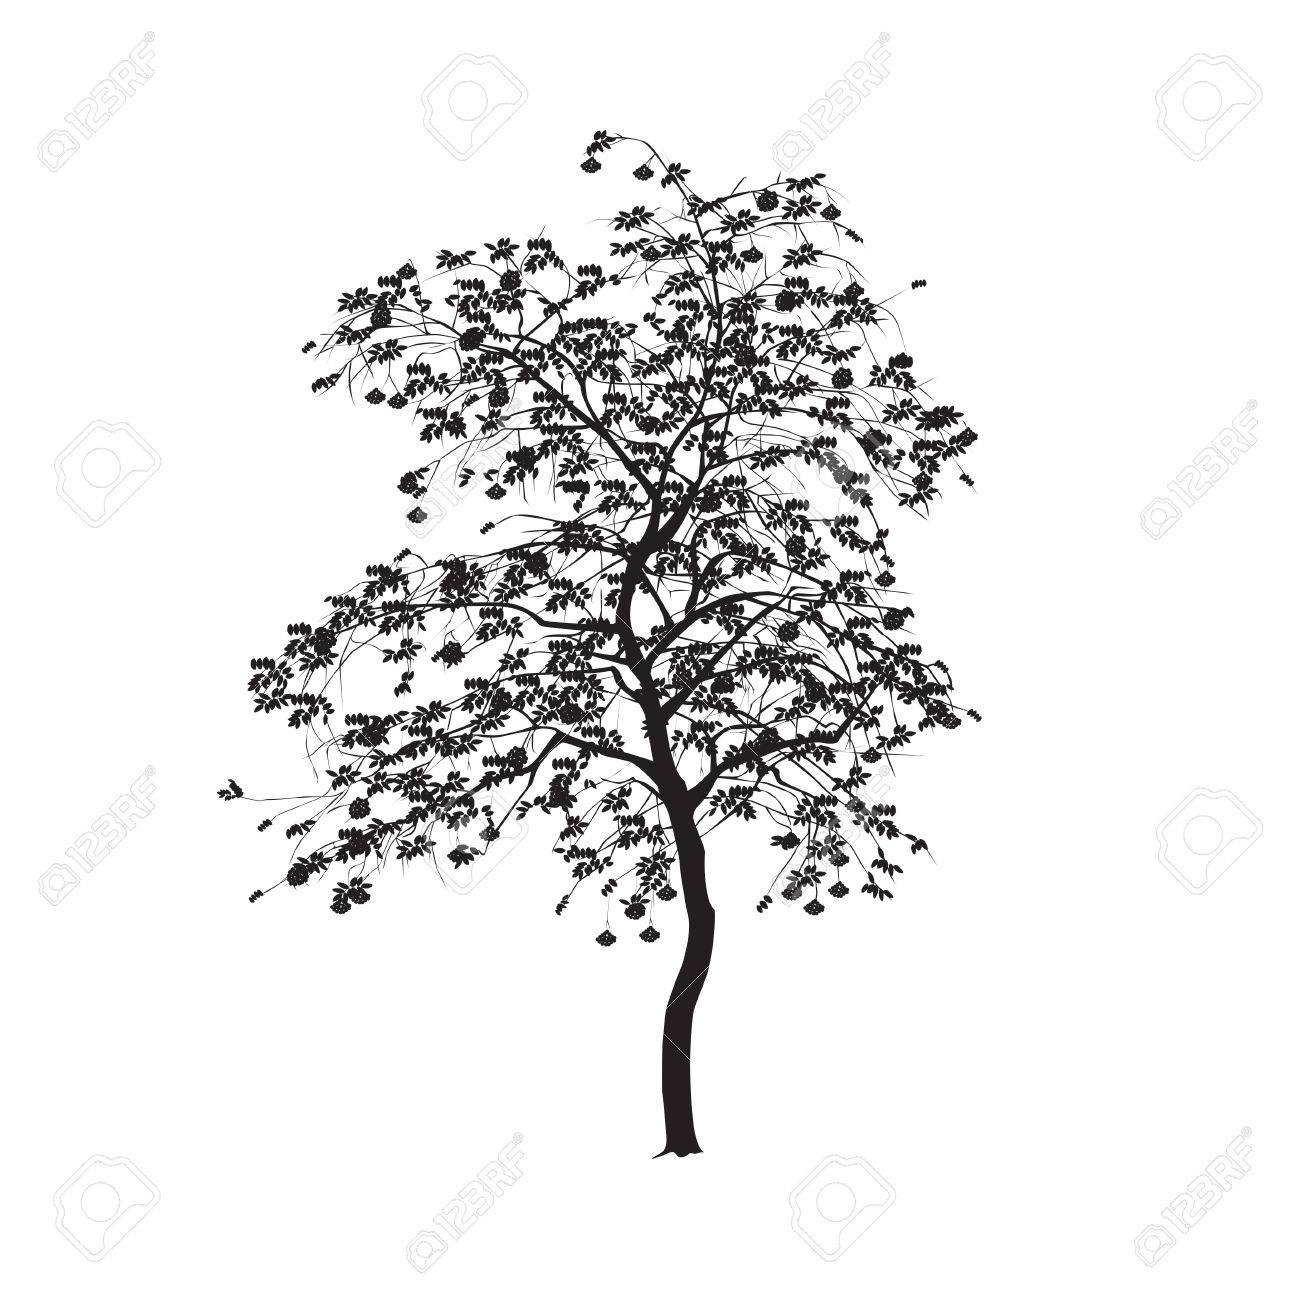 Ash Tree Silhouette.